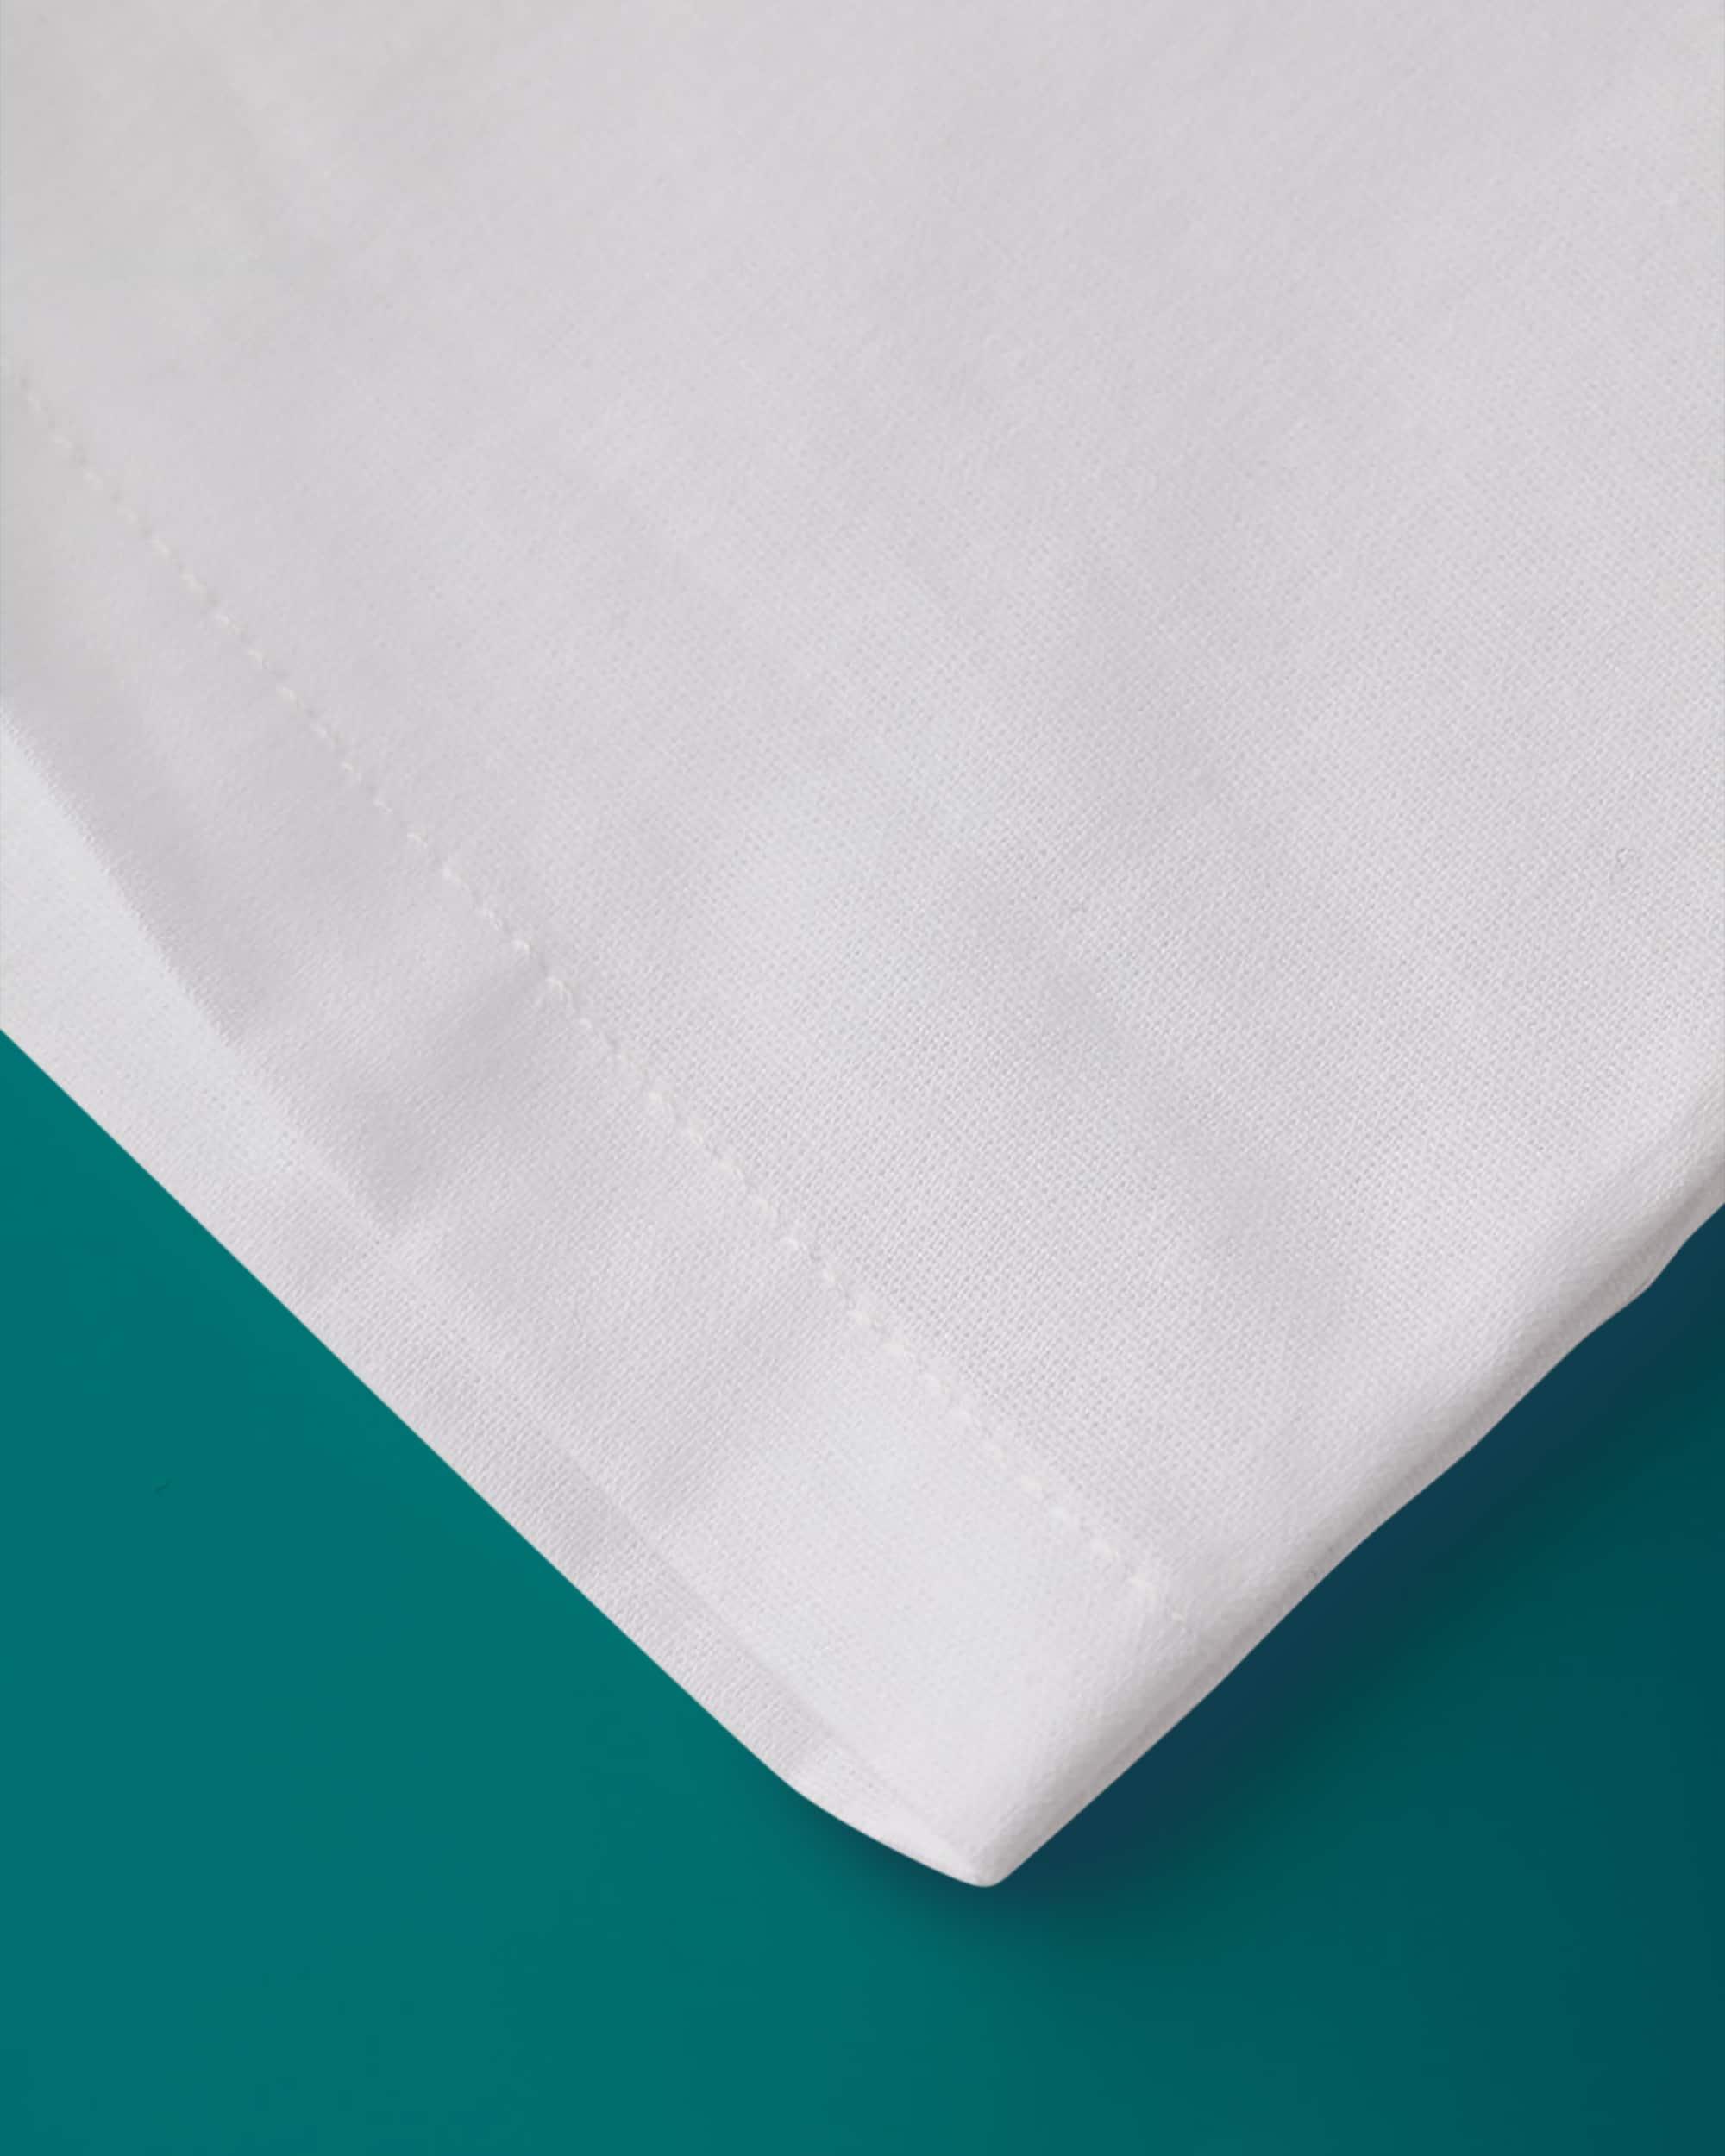 Regular Sized Pillow Case